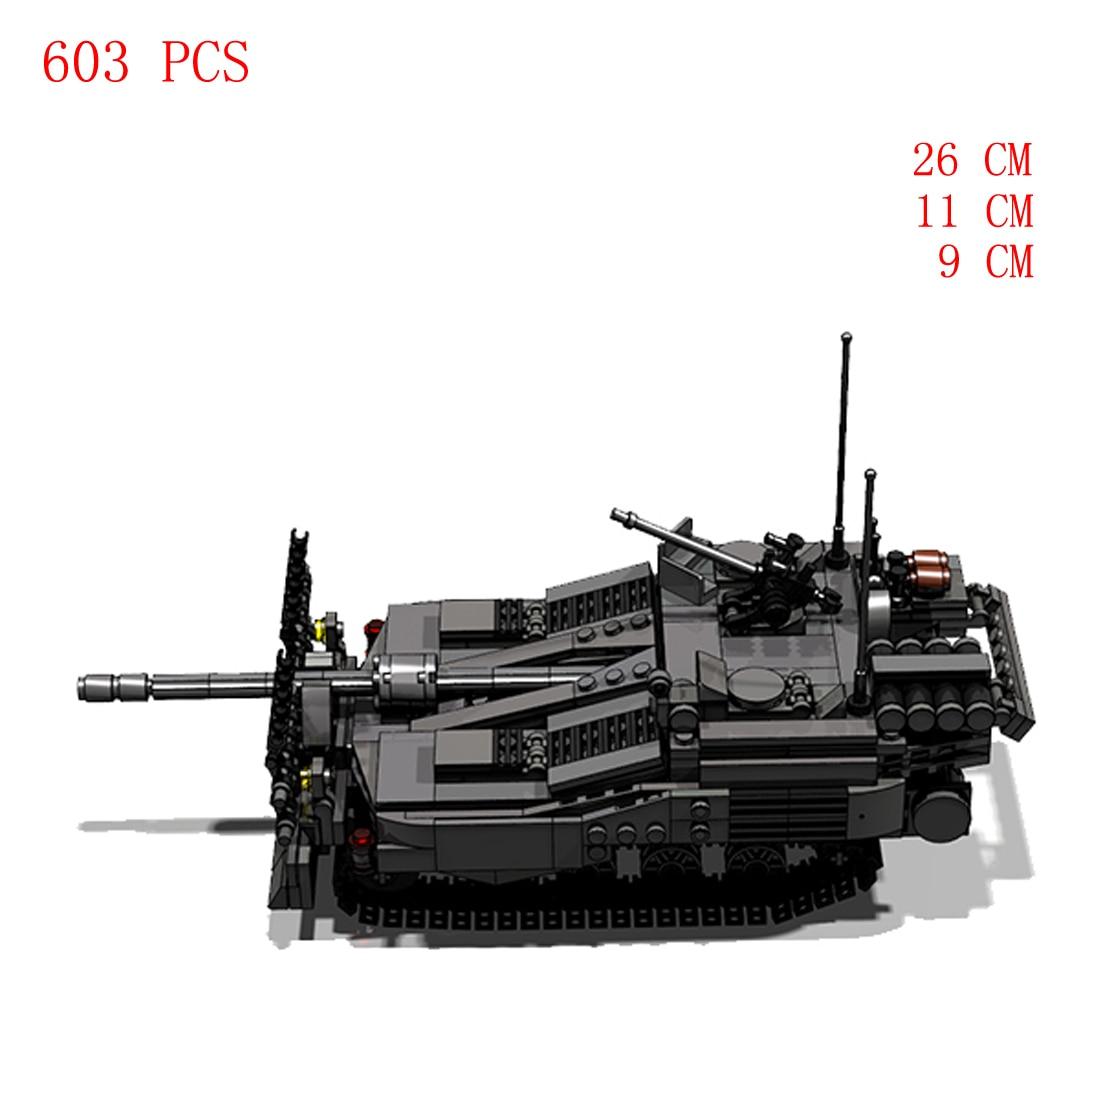 Купить с кэшбэком hot military WW2 Sweden army technical STRV-103B tank vehicles war weapons equipment bricks model Building Blocks toys for gift